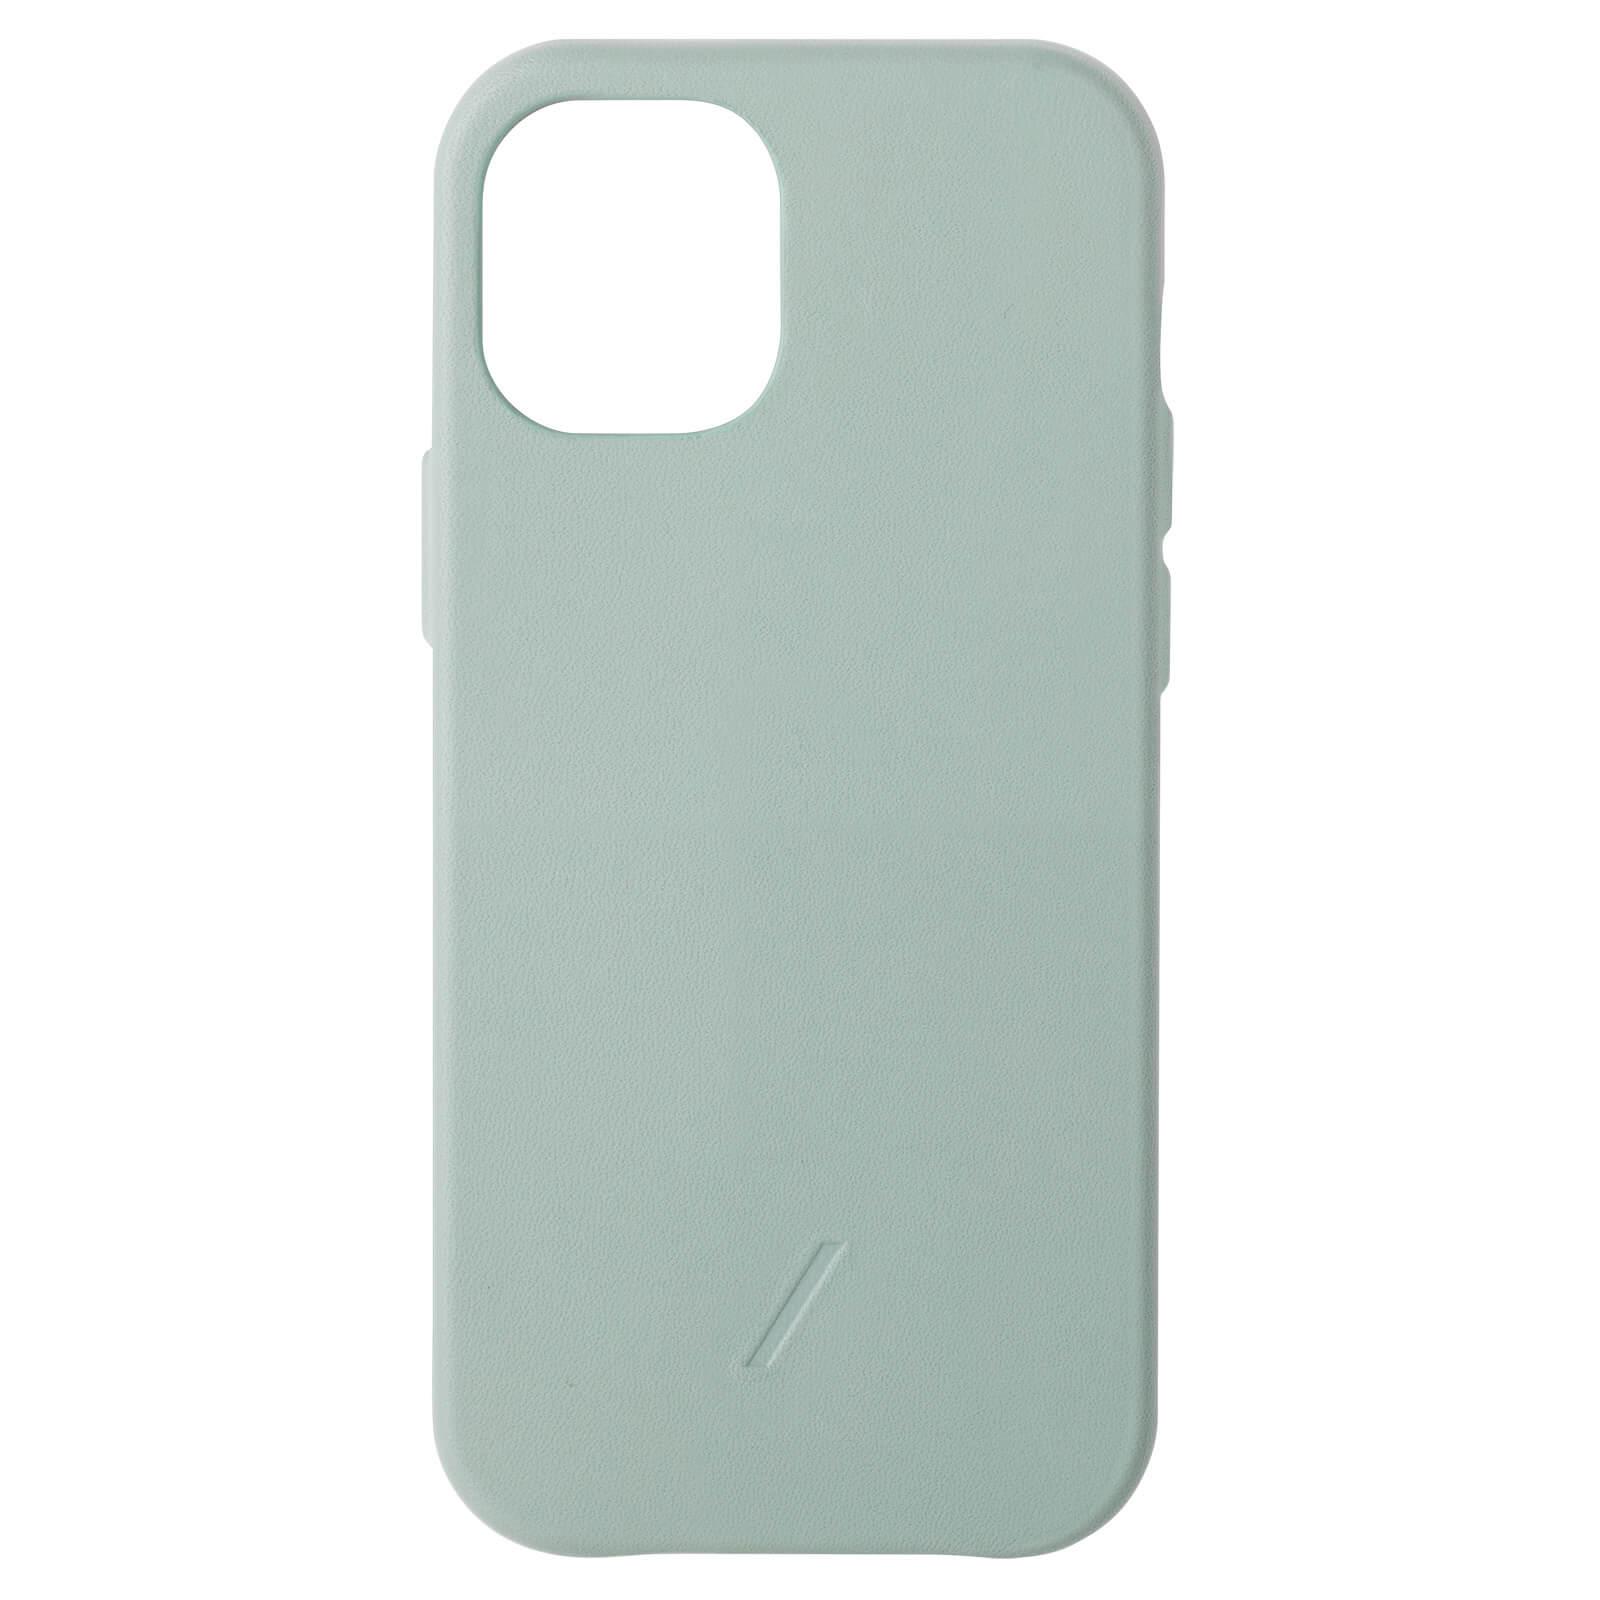 Native Union Clic Classic iPhone Case - Sage - iPhone 12/12 Pro